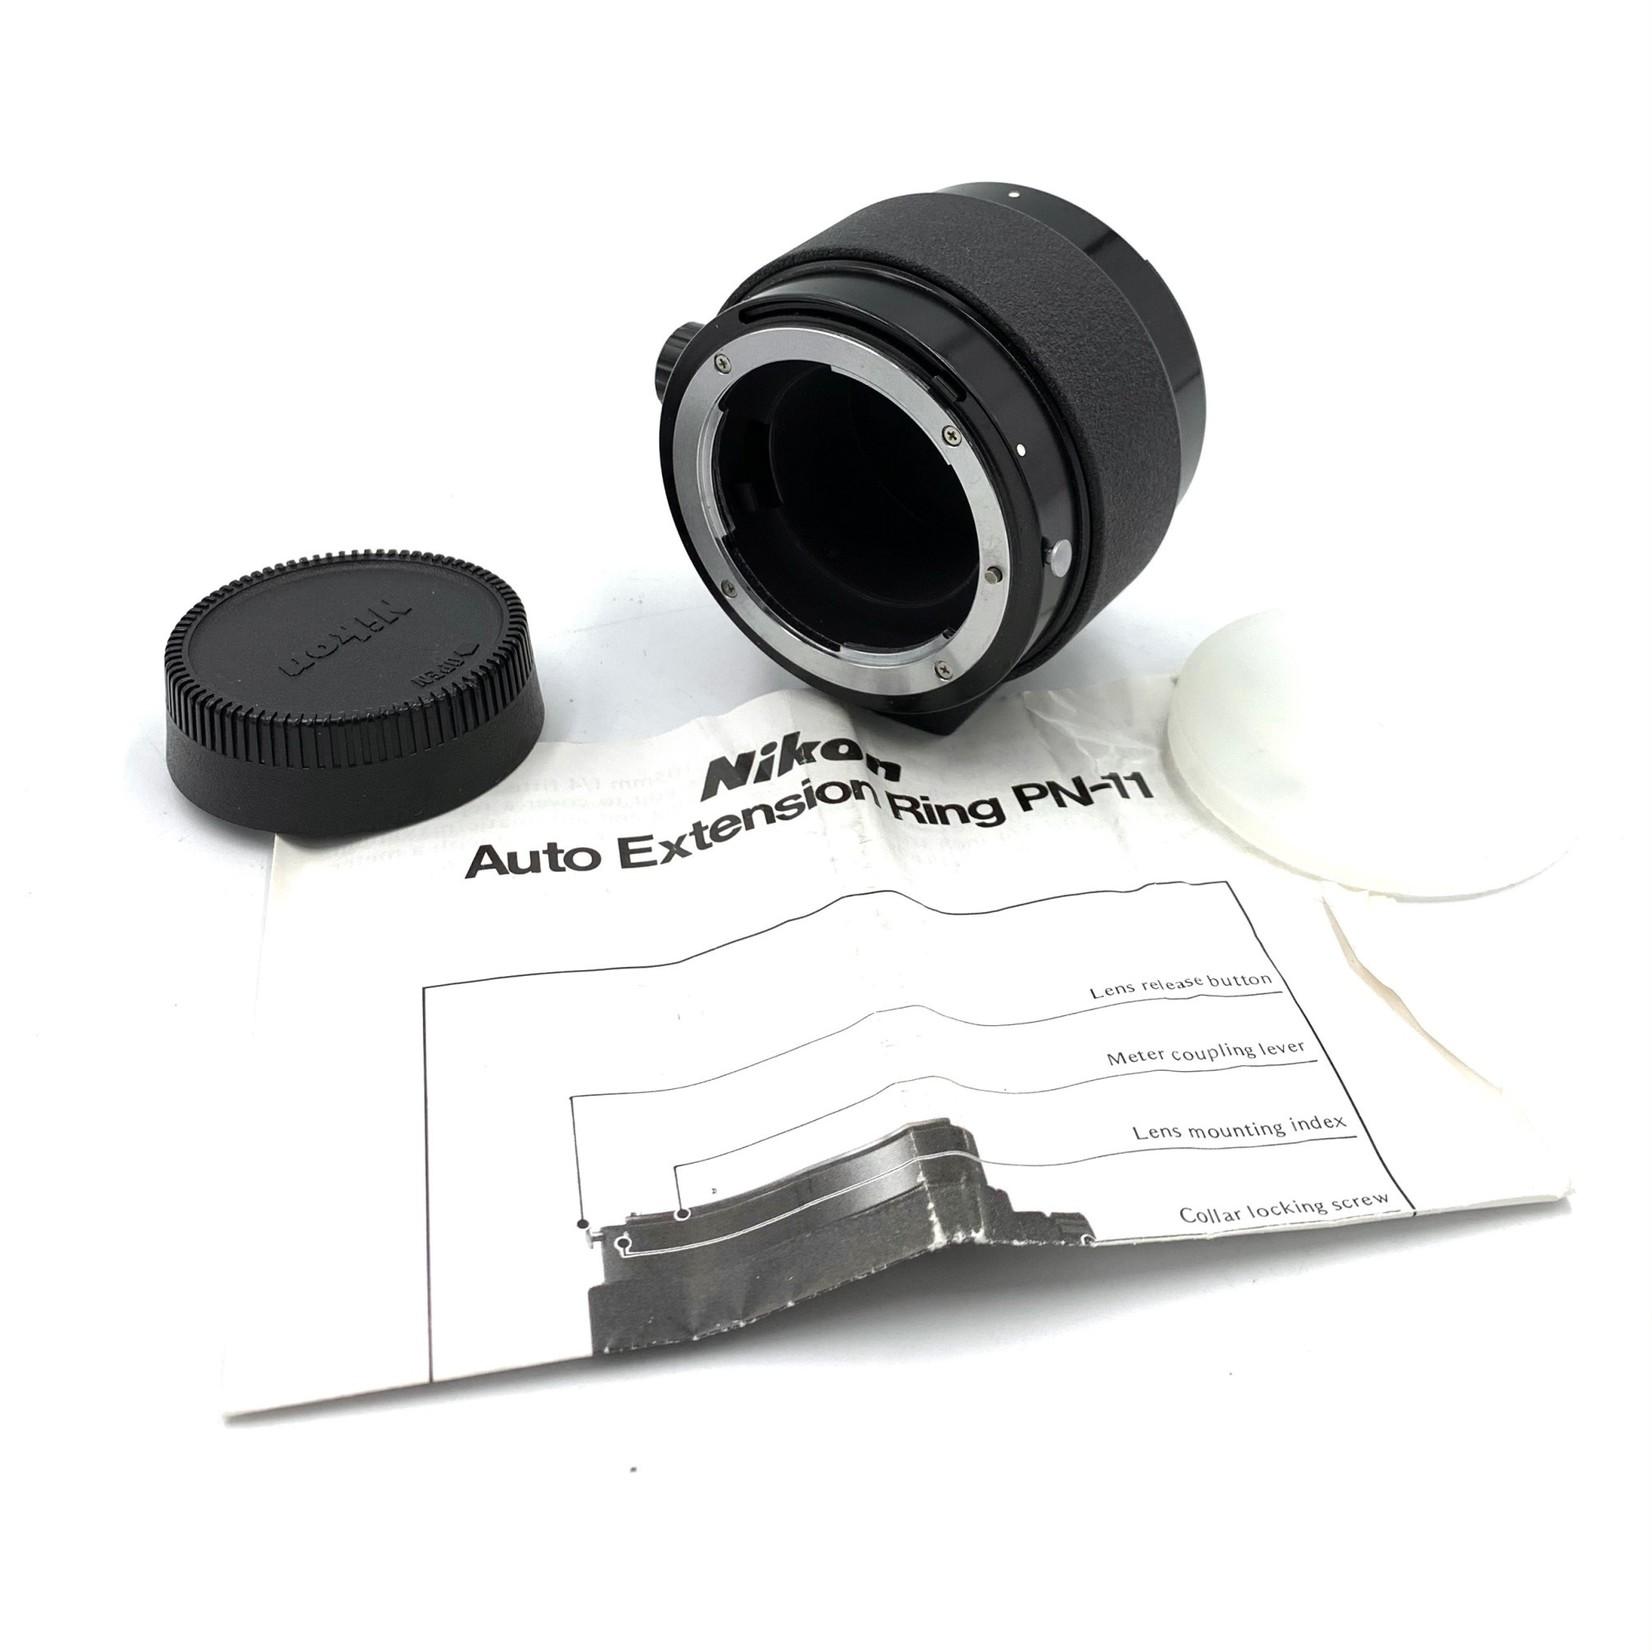 USED Nikon PN-11 Auto Extension Ring